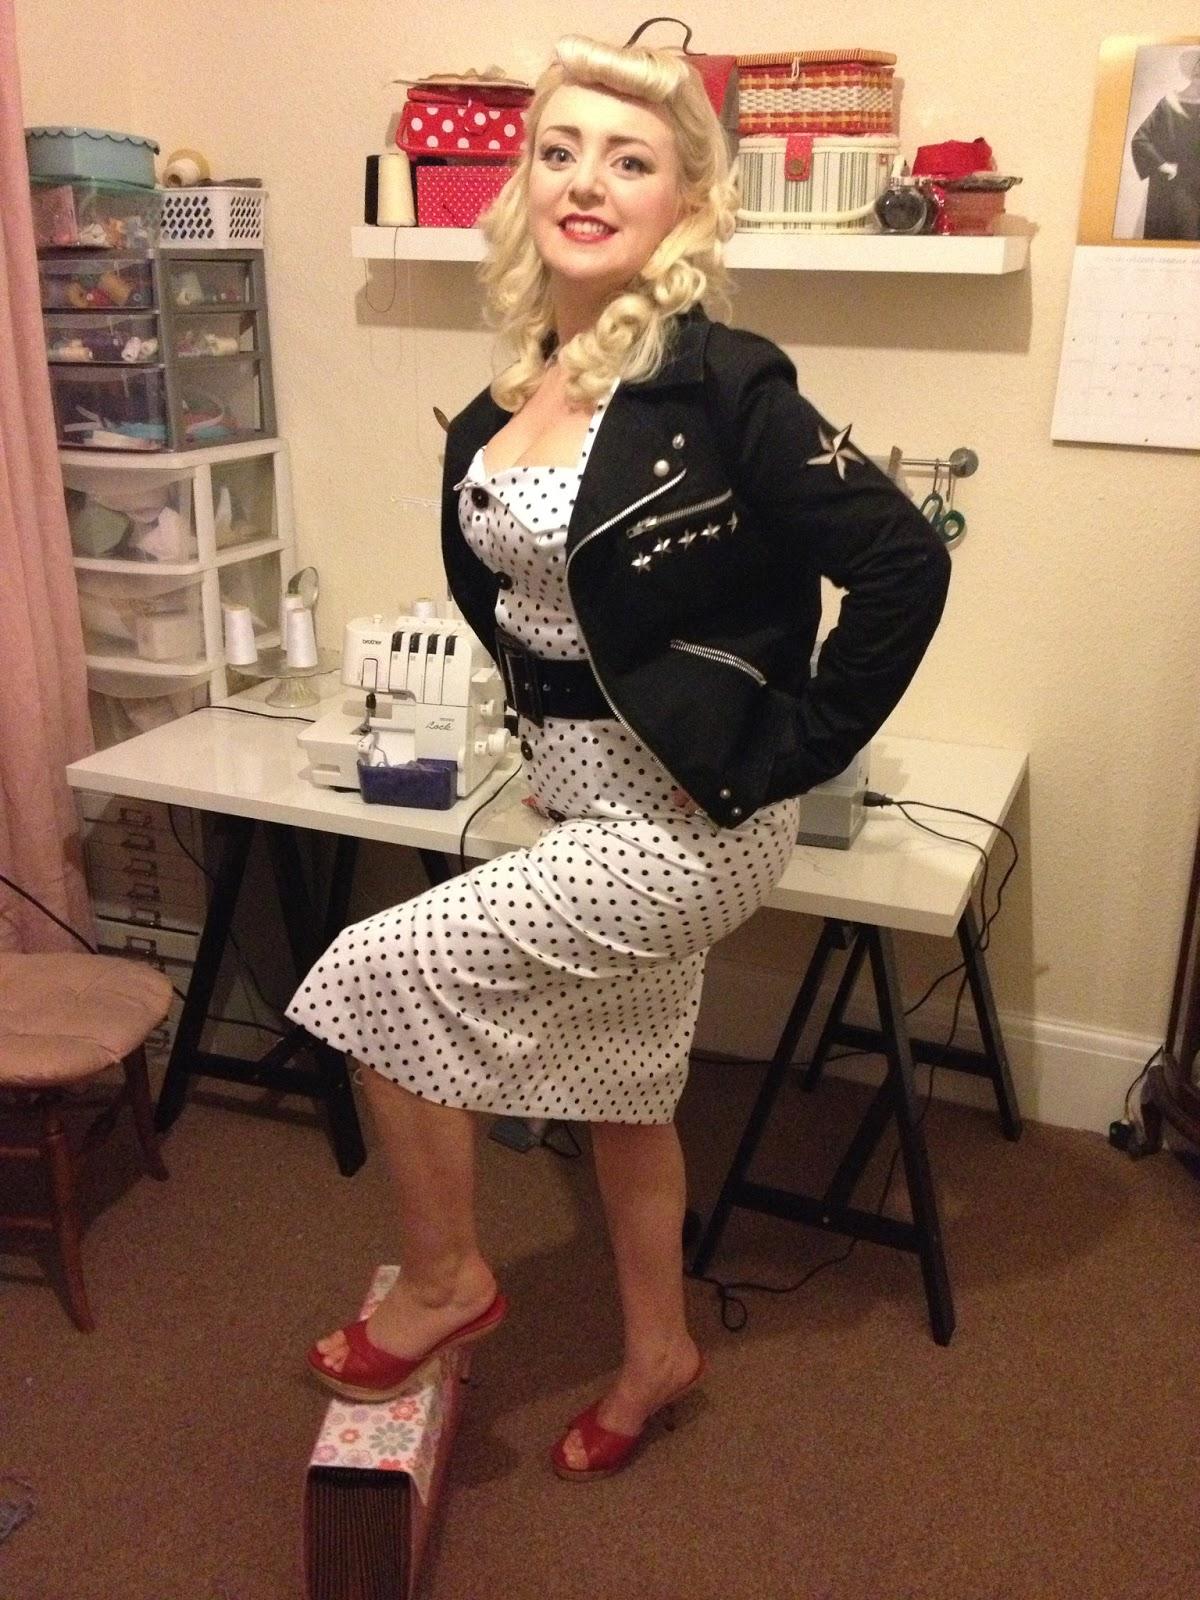 BooBoo Kitty Couture: THE Cry Baby Wanda Dress